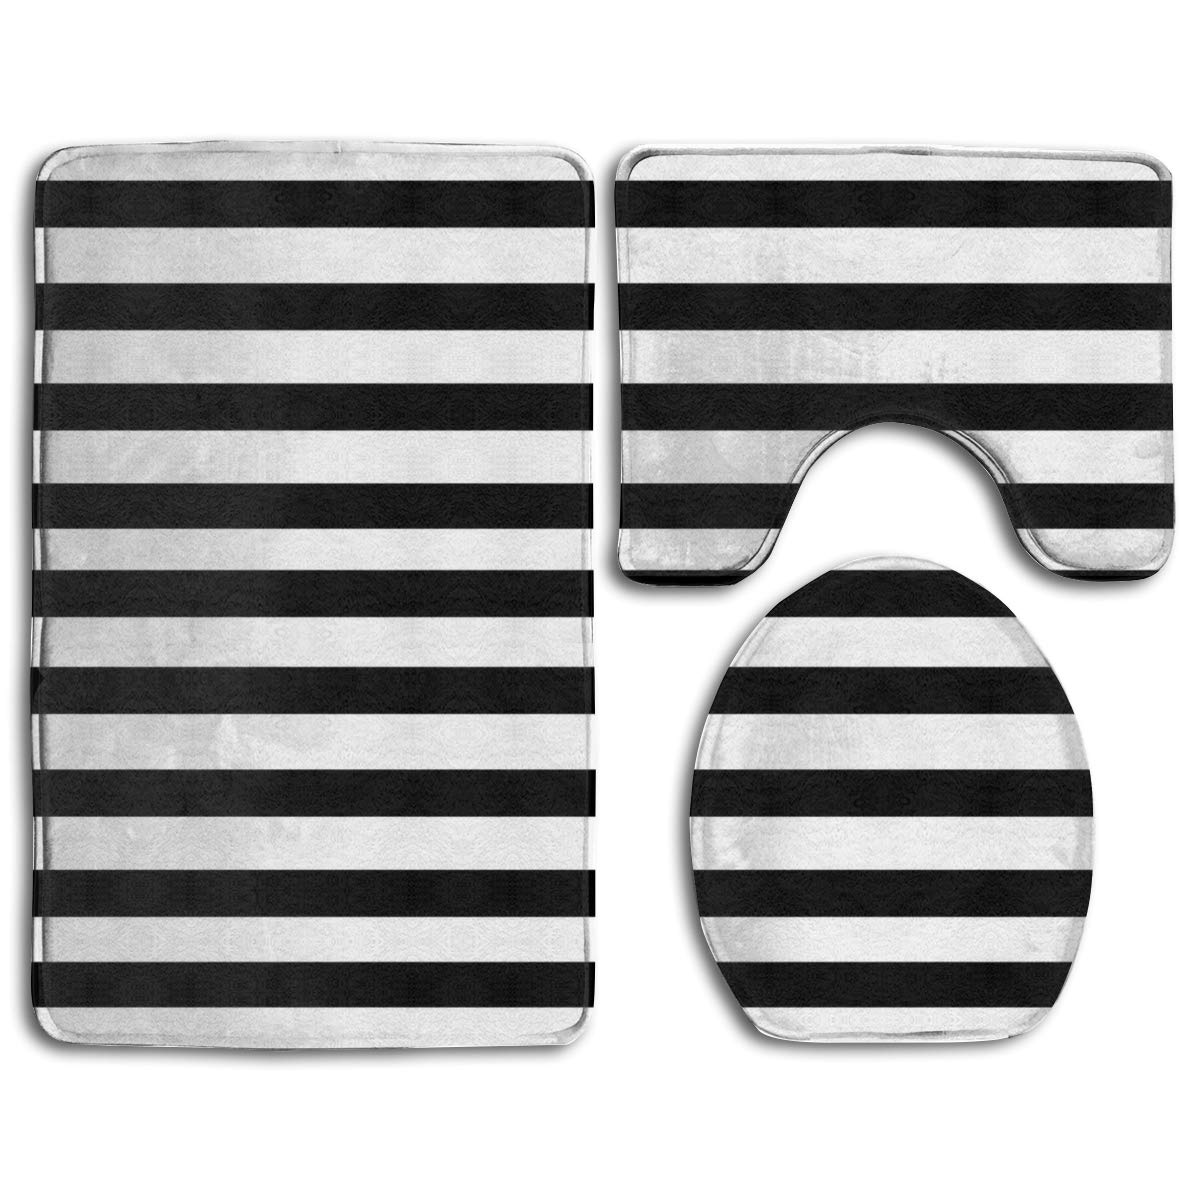 Gohao Black And White Mosaic Vertical Stripes 3 Piece Bathroom Rugs Set Bath Rug Contour Mat And Toilet Lid Cover Walmart Com Walmart Com